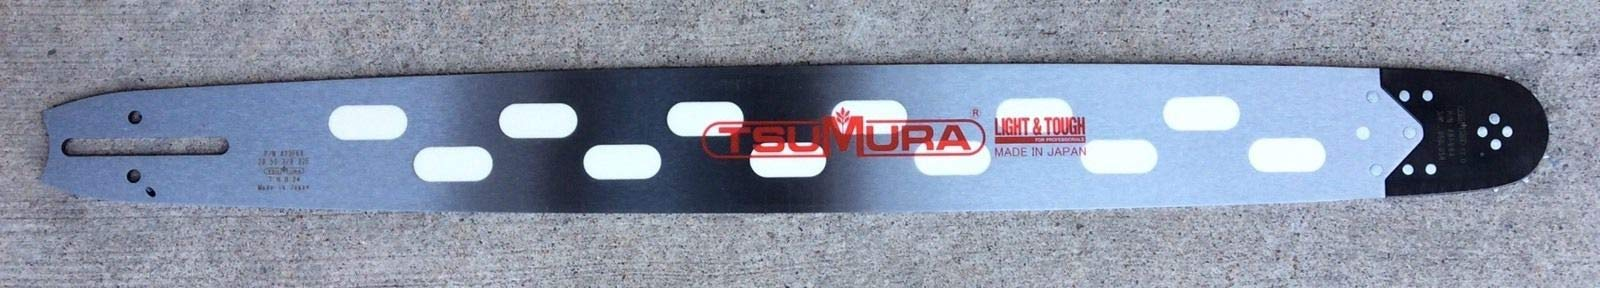 TsuMura 24'' Light Weight Bar D009 Mount Husqvarna 372XP 385XP 575XP 394XP 570 3120XP